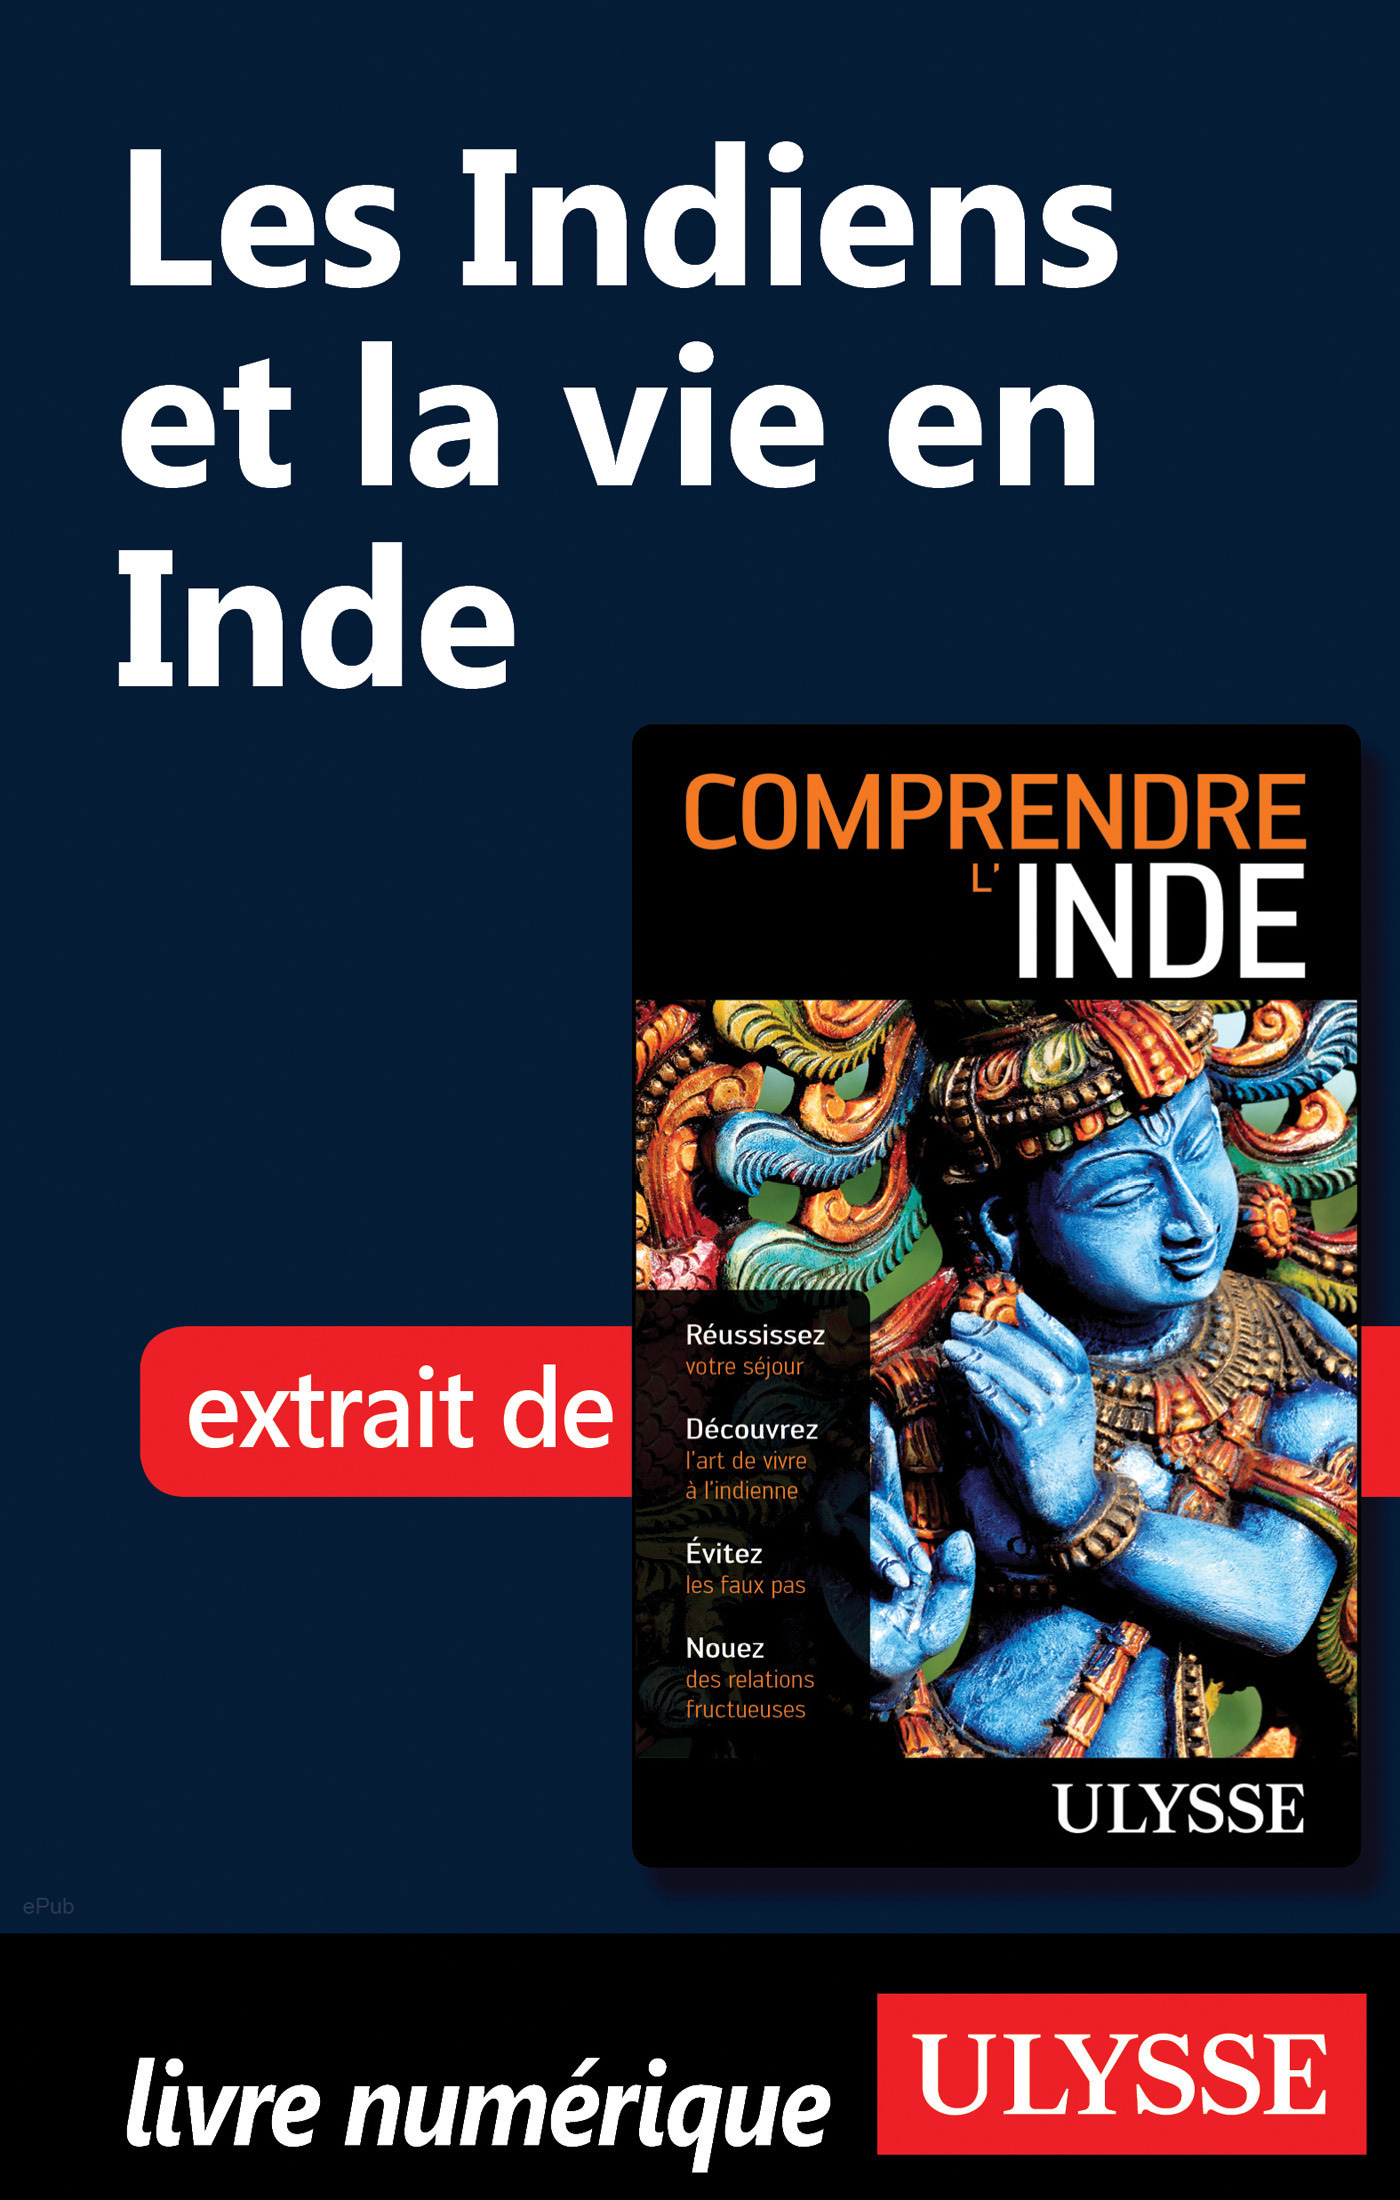 Les Indiens et la vie en Inde (ebook)